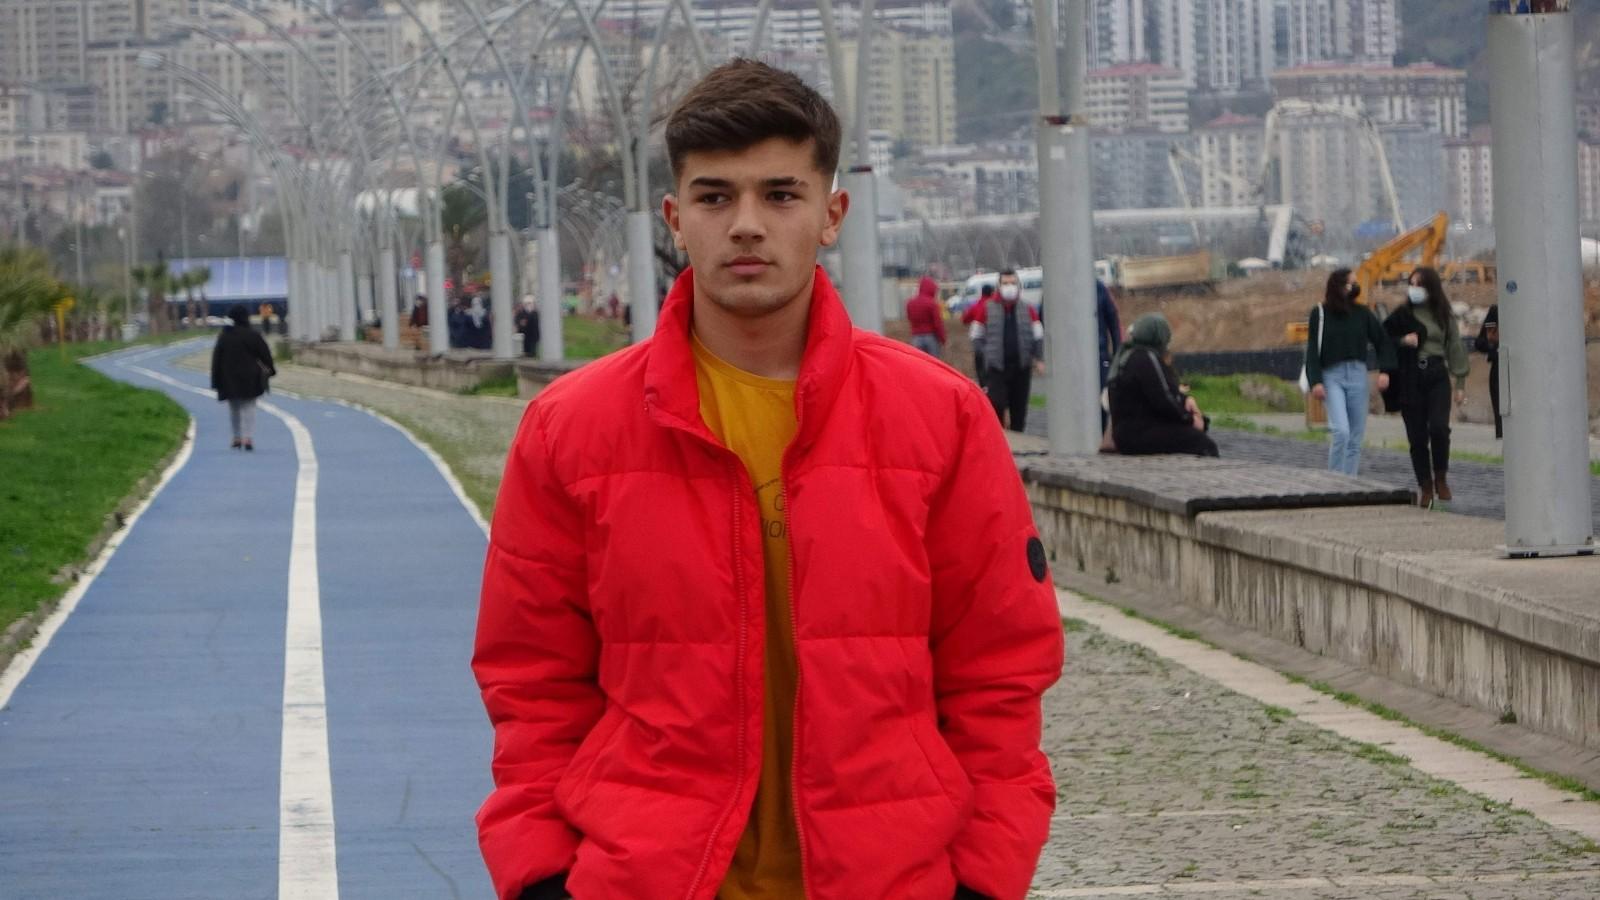 Apple'nin reklam yüzü Trabzon'dan - Trabzon Haberleri